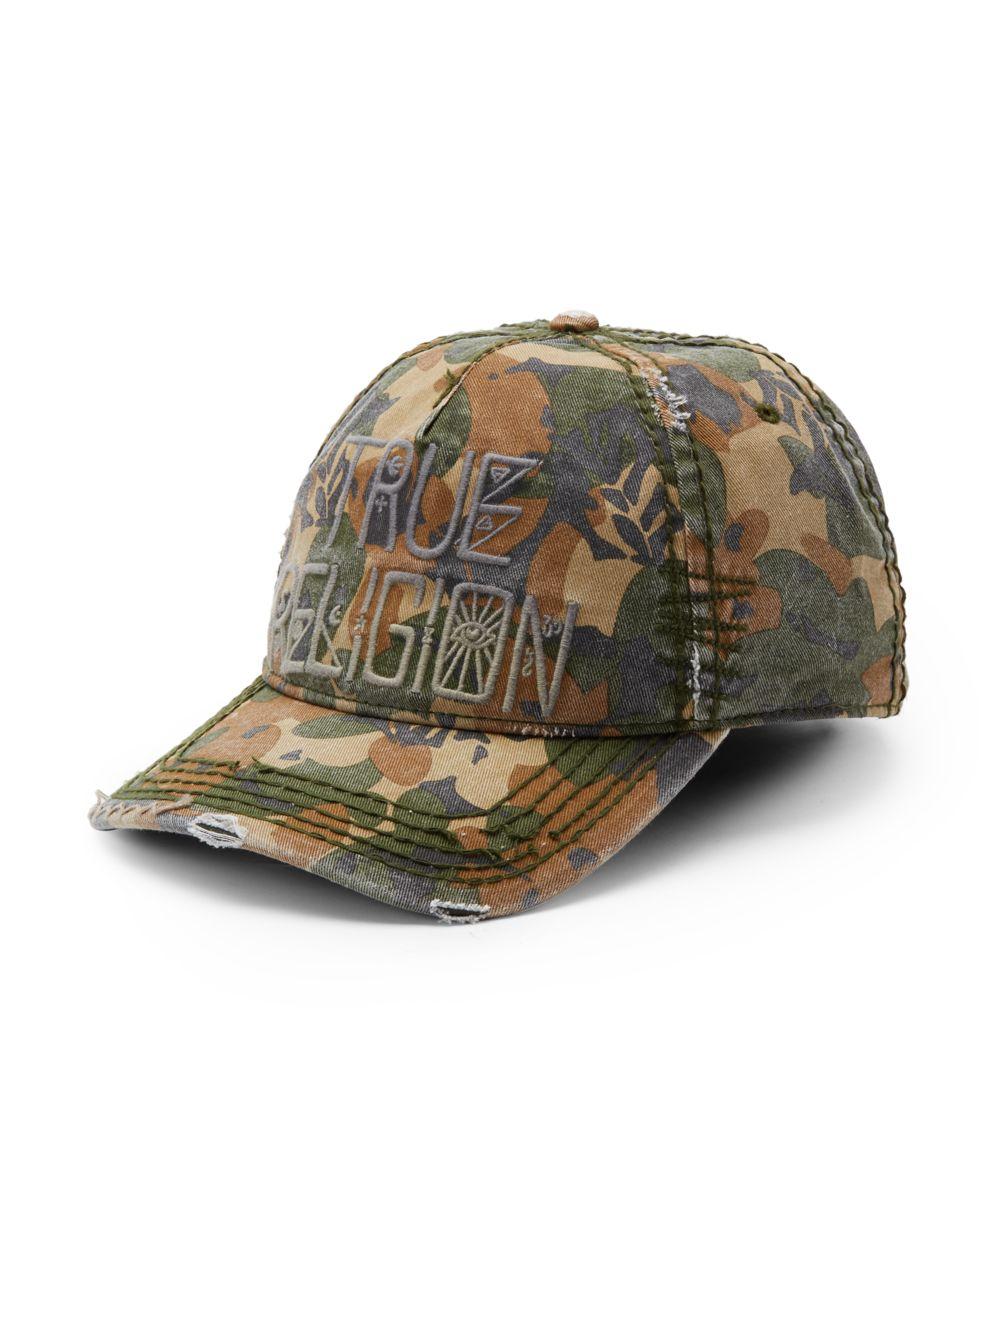 lyst true religion camouflageprint twill baseball cap in green for men. Black Bedroom Furniture Sets. Home Design Ideas